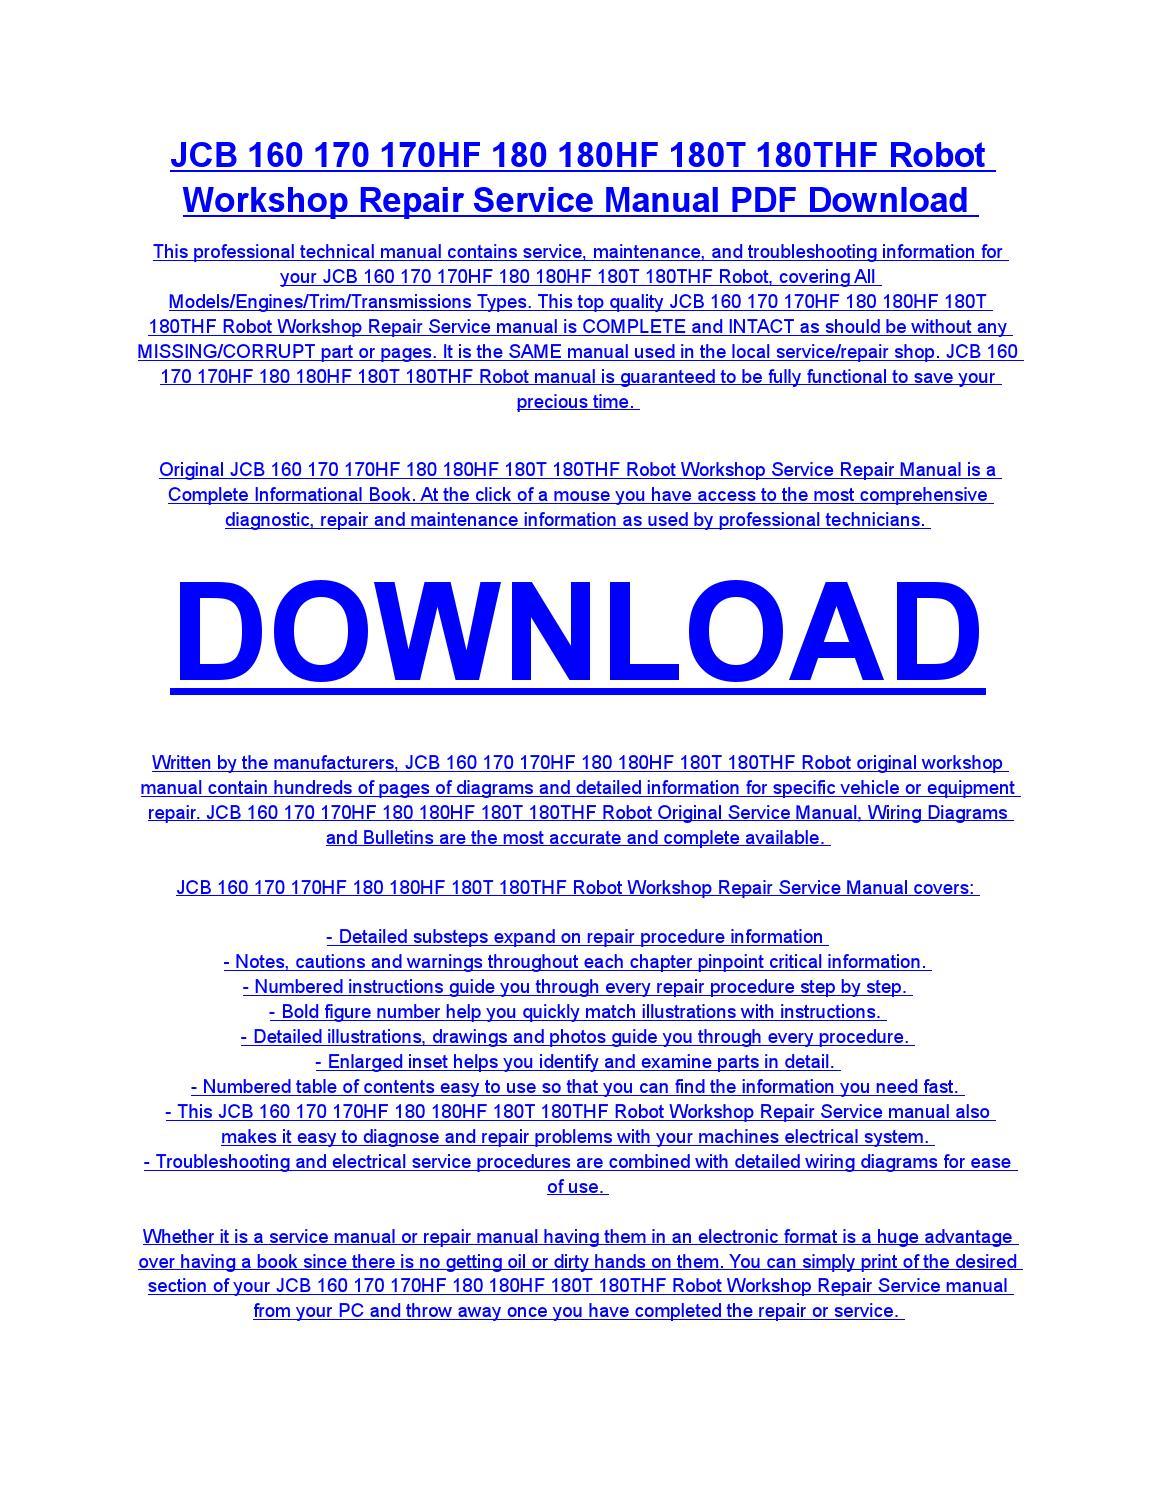 Jcb 160 170 170hf 180 180hf 180t 180thf robot service repair ... Jcb Robot Wiring Diagram on